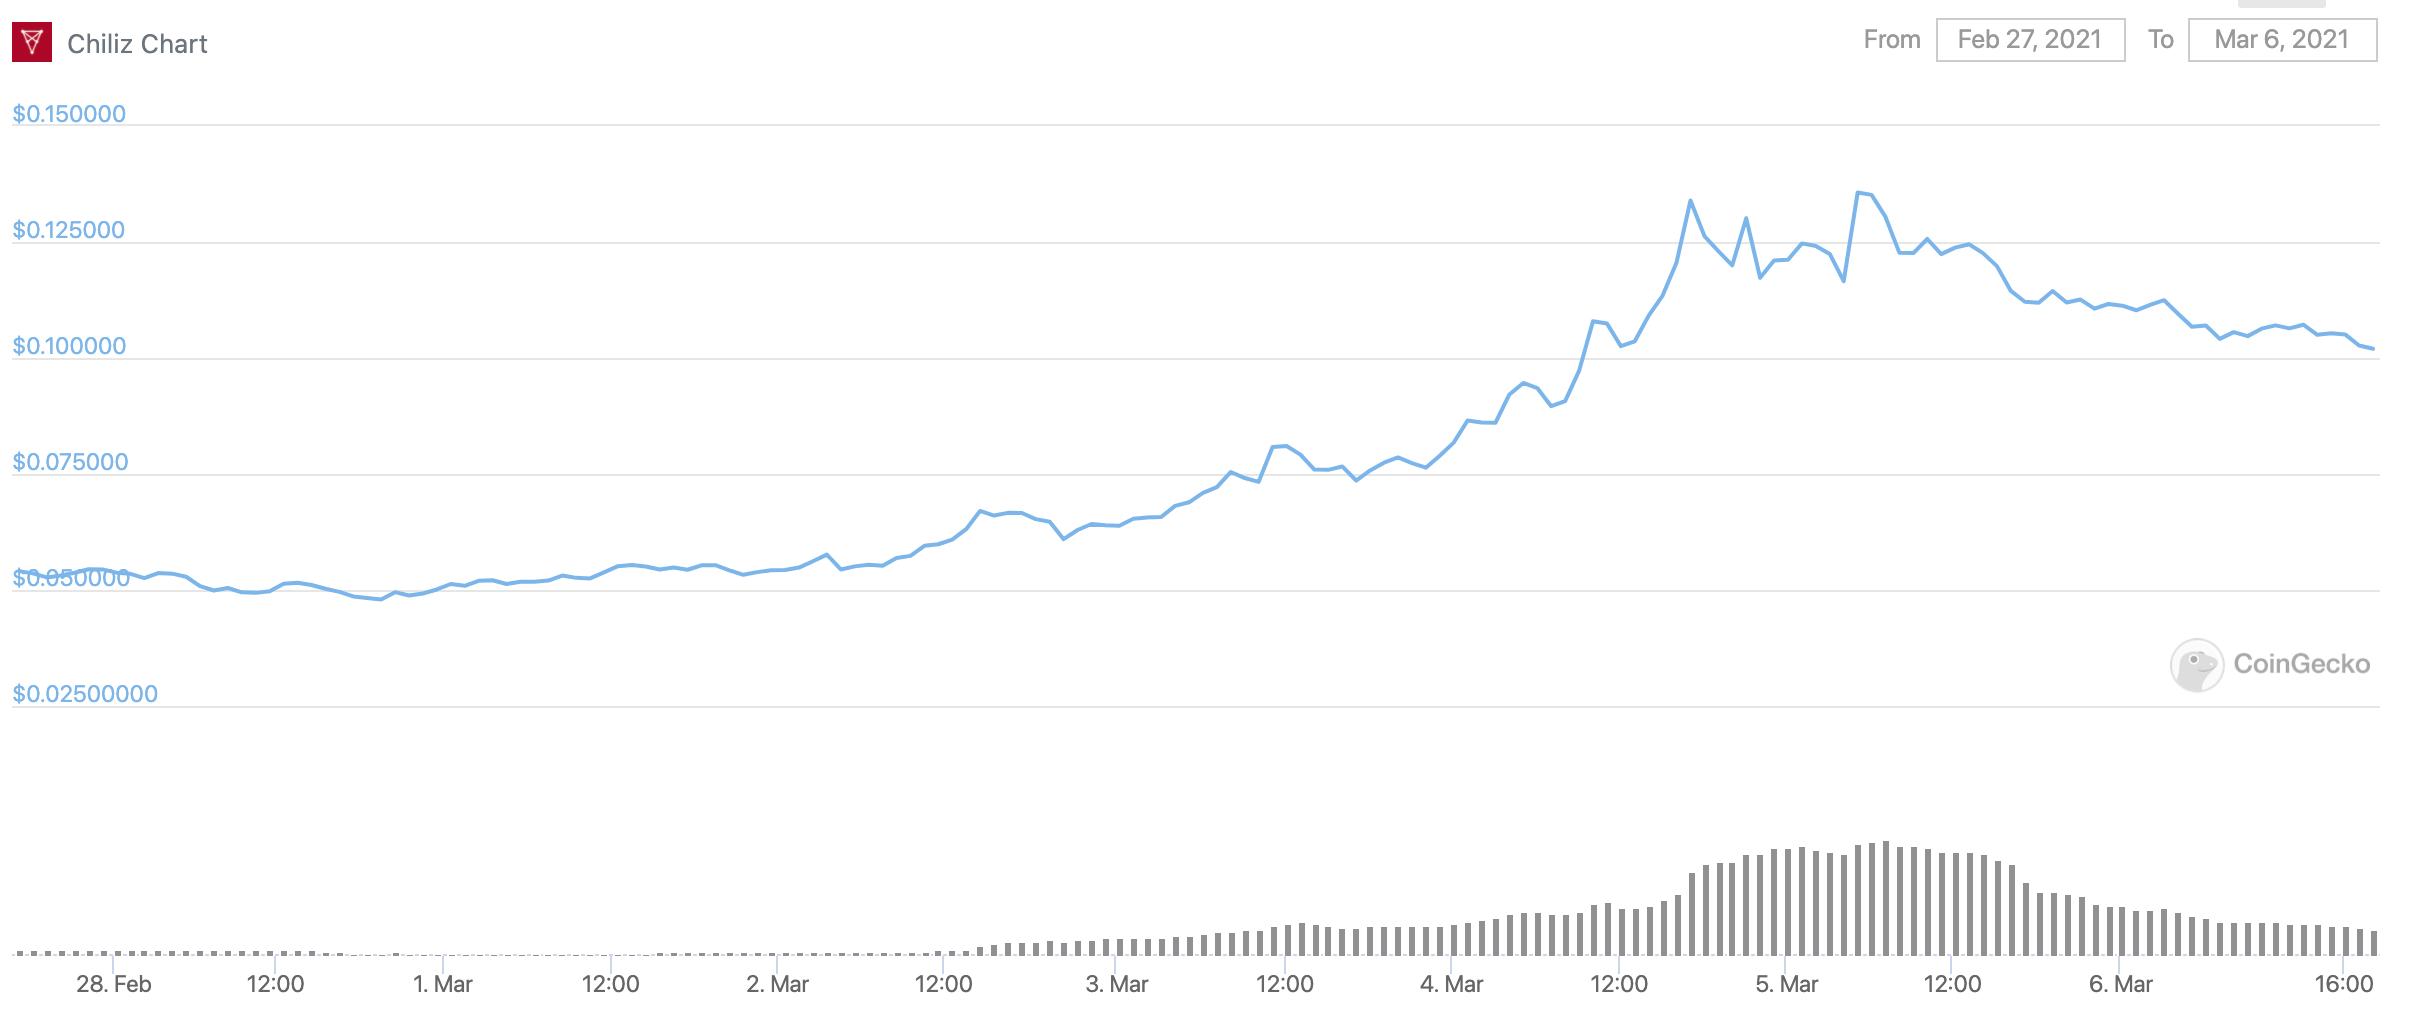 chiliz-chz-price-chart